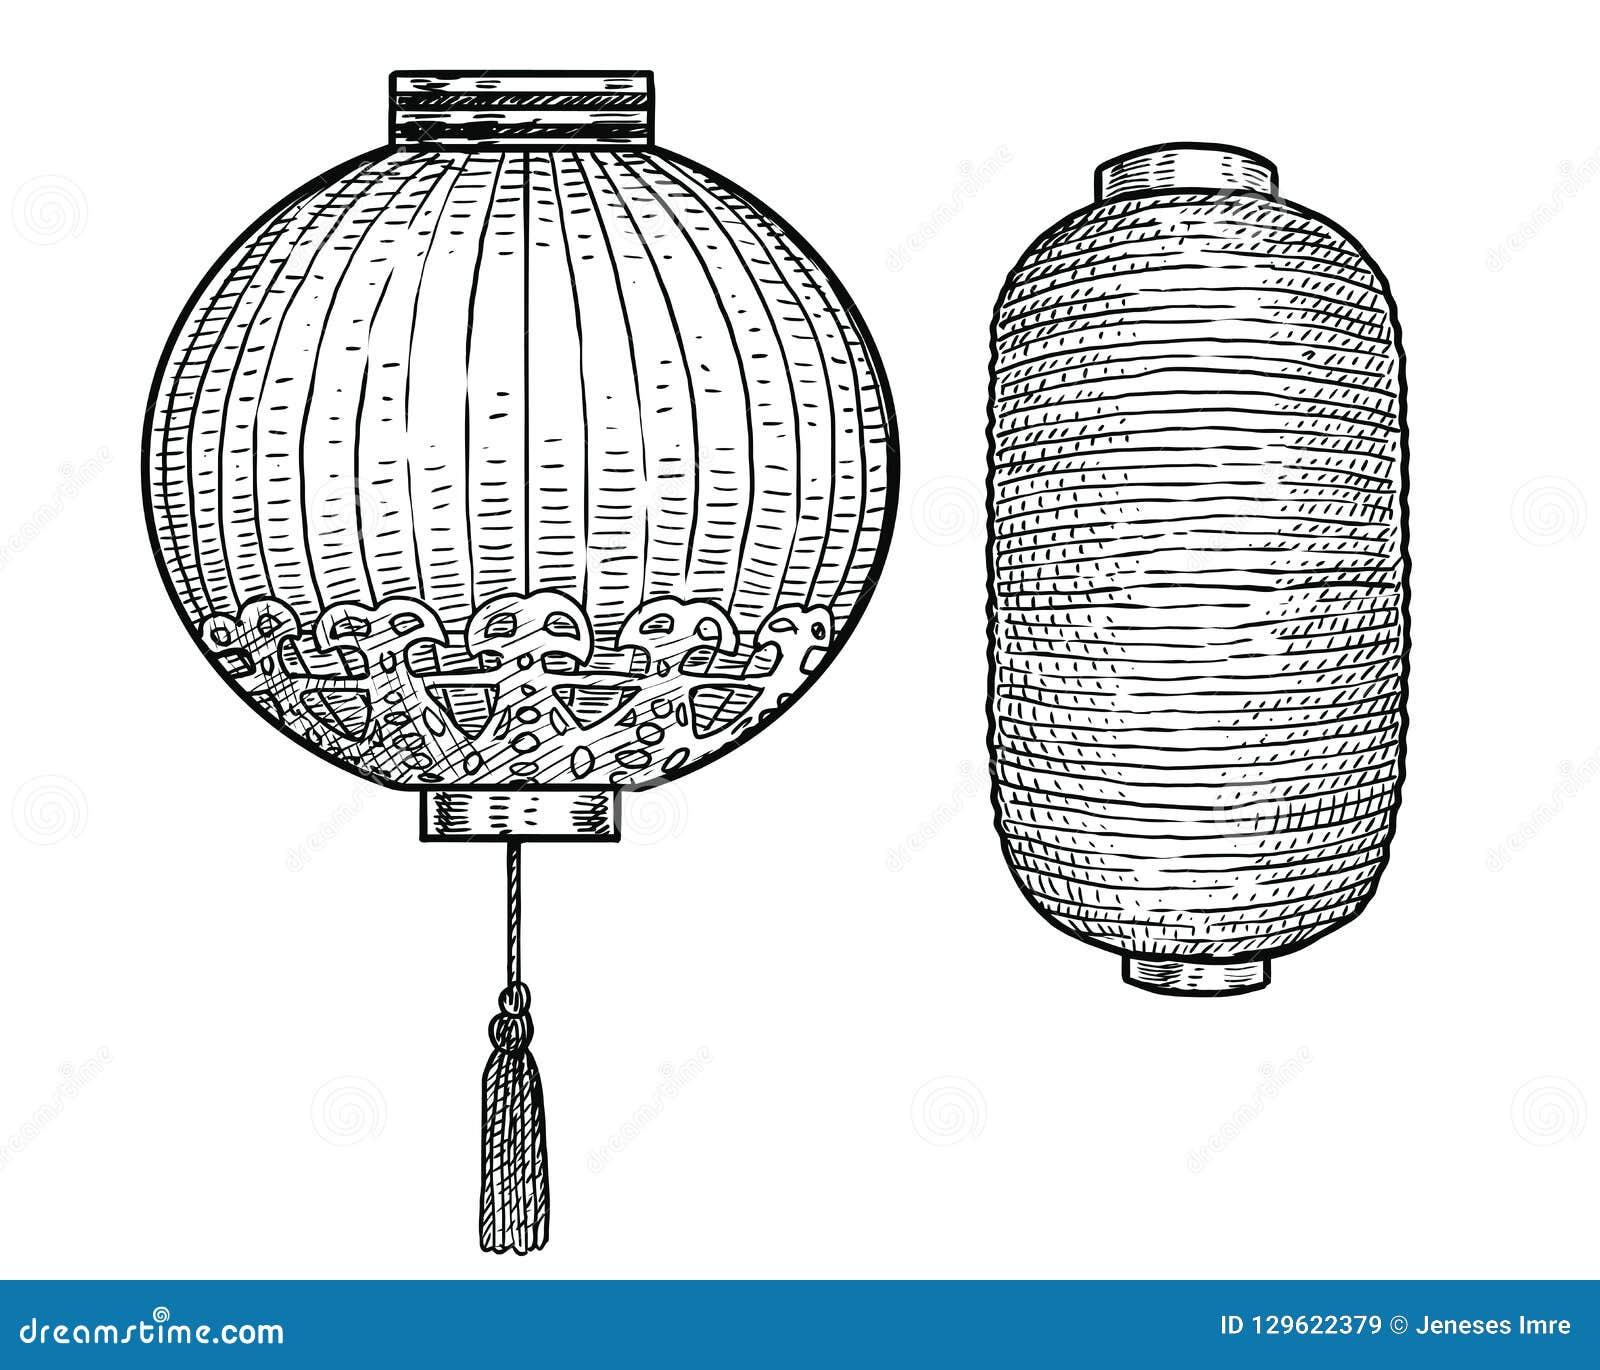 Japanese Paper Lantern Illustration, Drawing, Engraving, Ink, Line